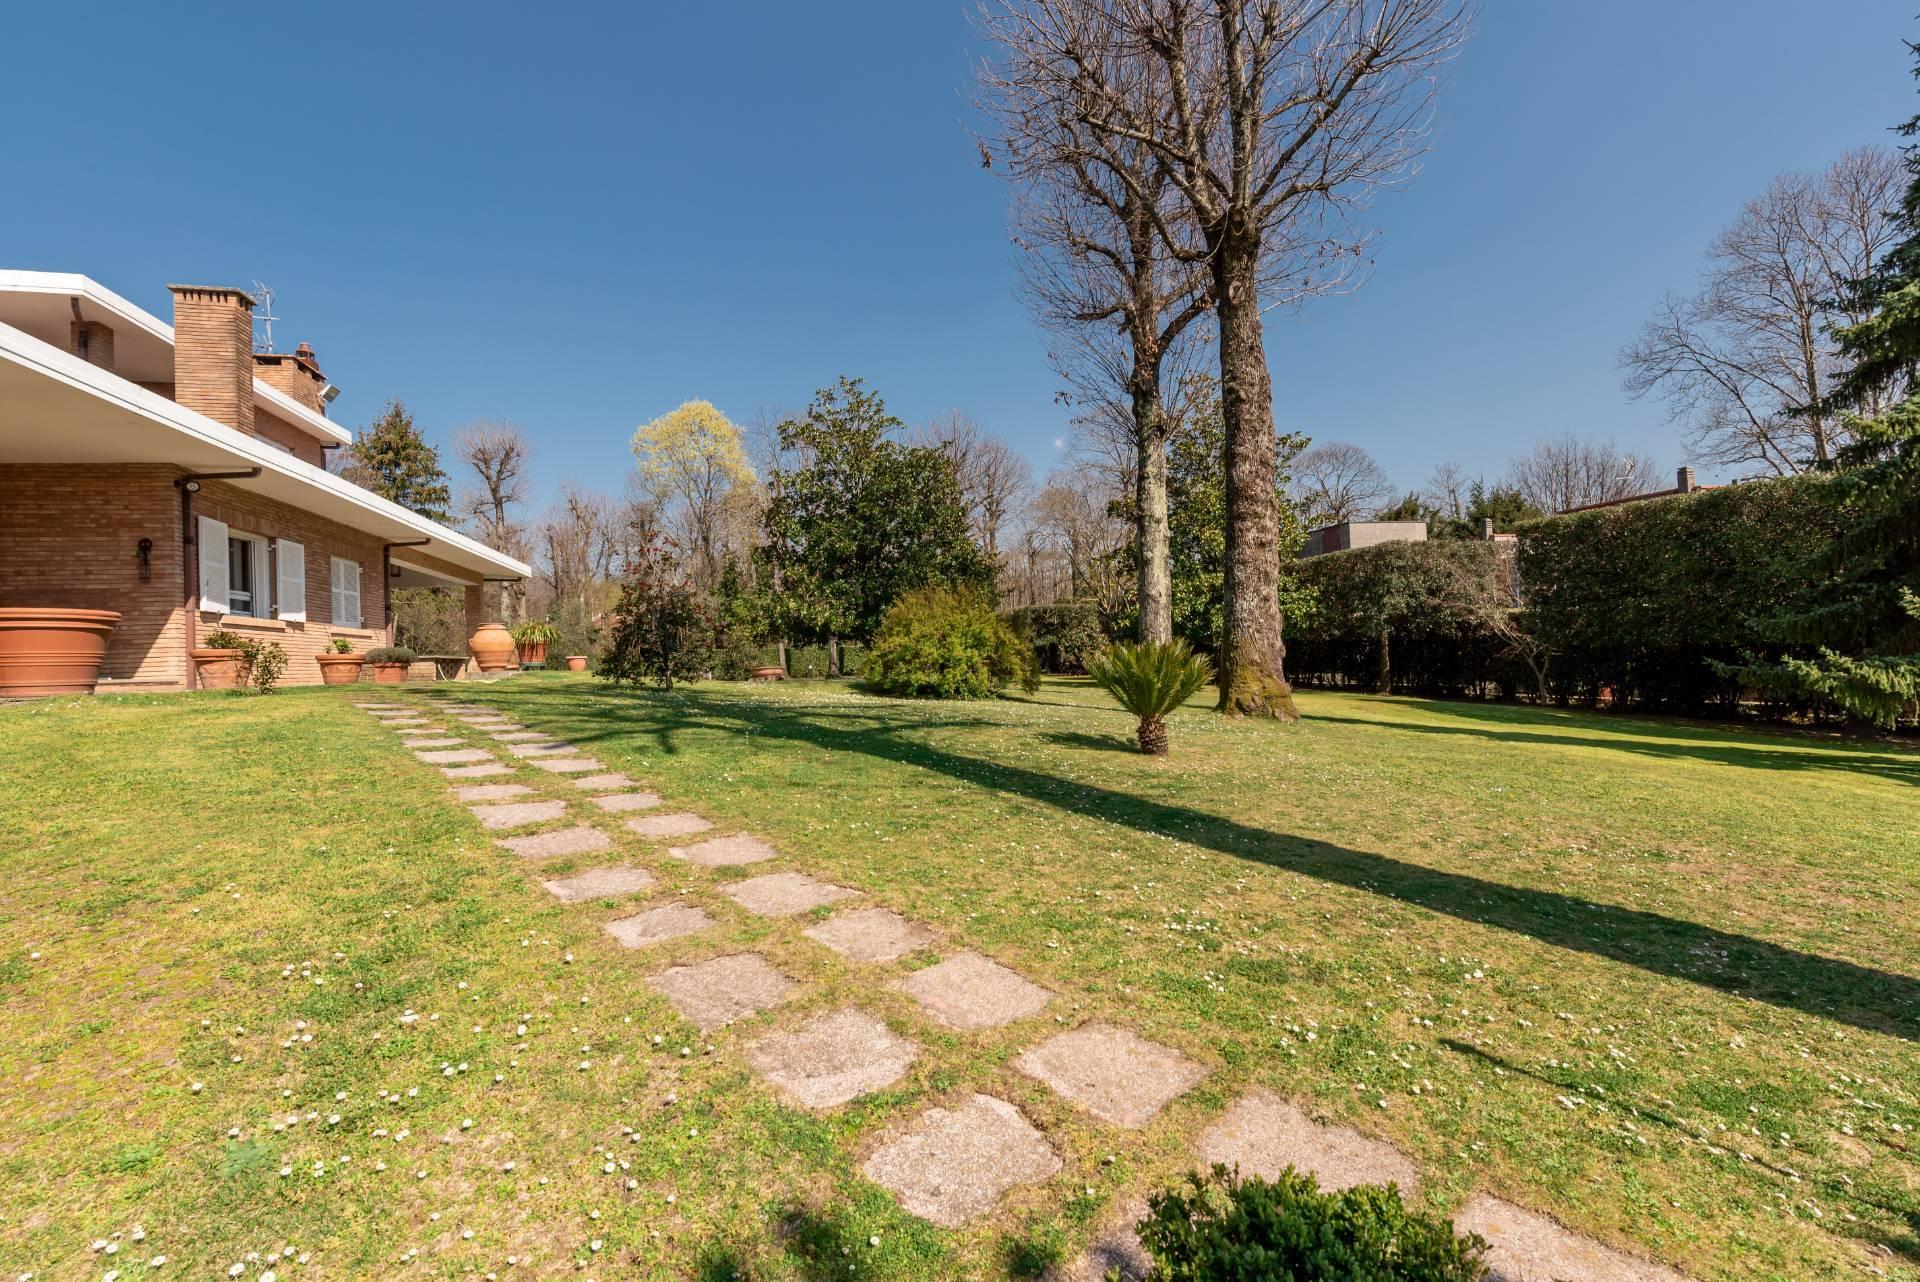 Villa in Vendita a Ariccia: 5 locali, 583 mq - Foto 28